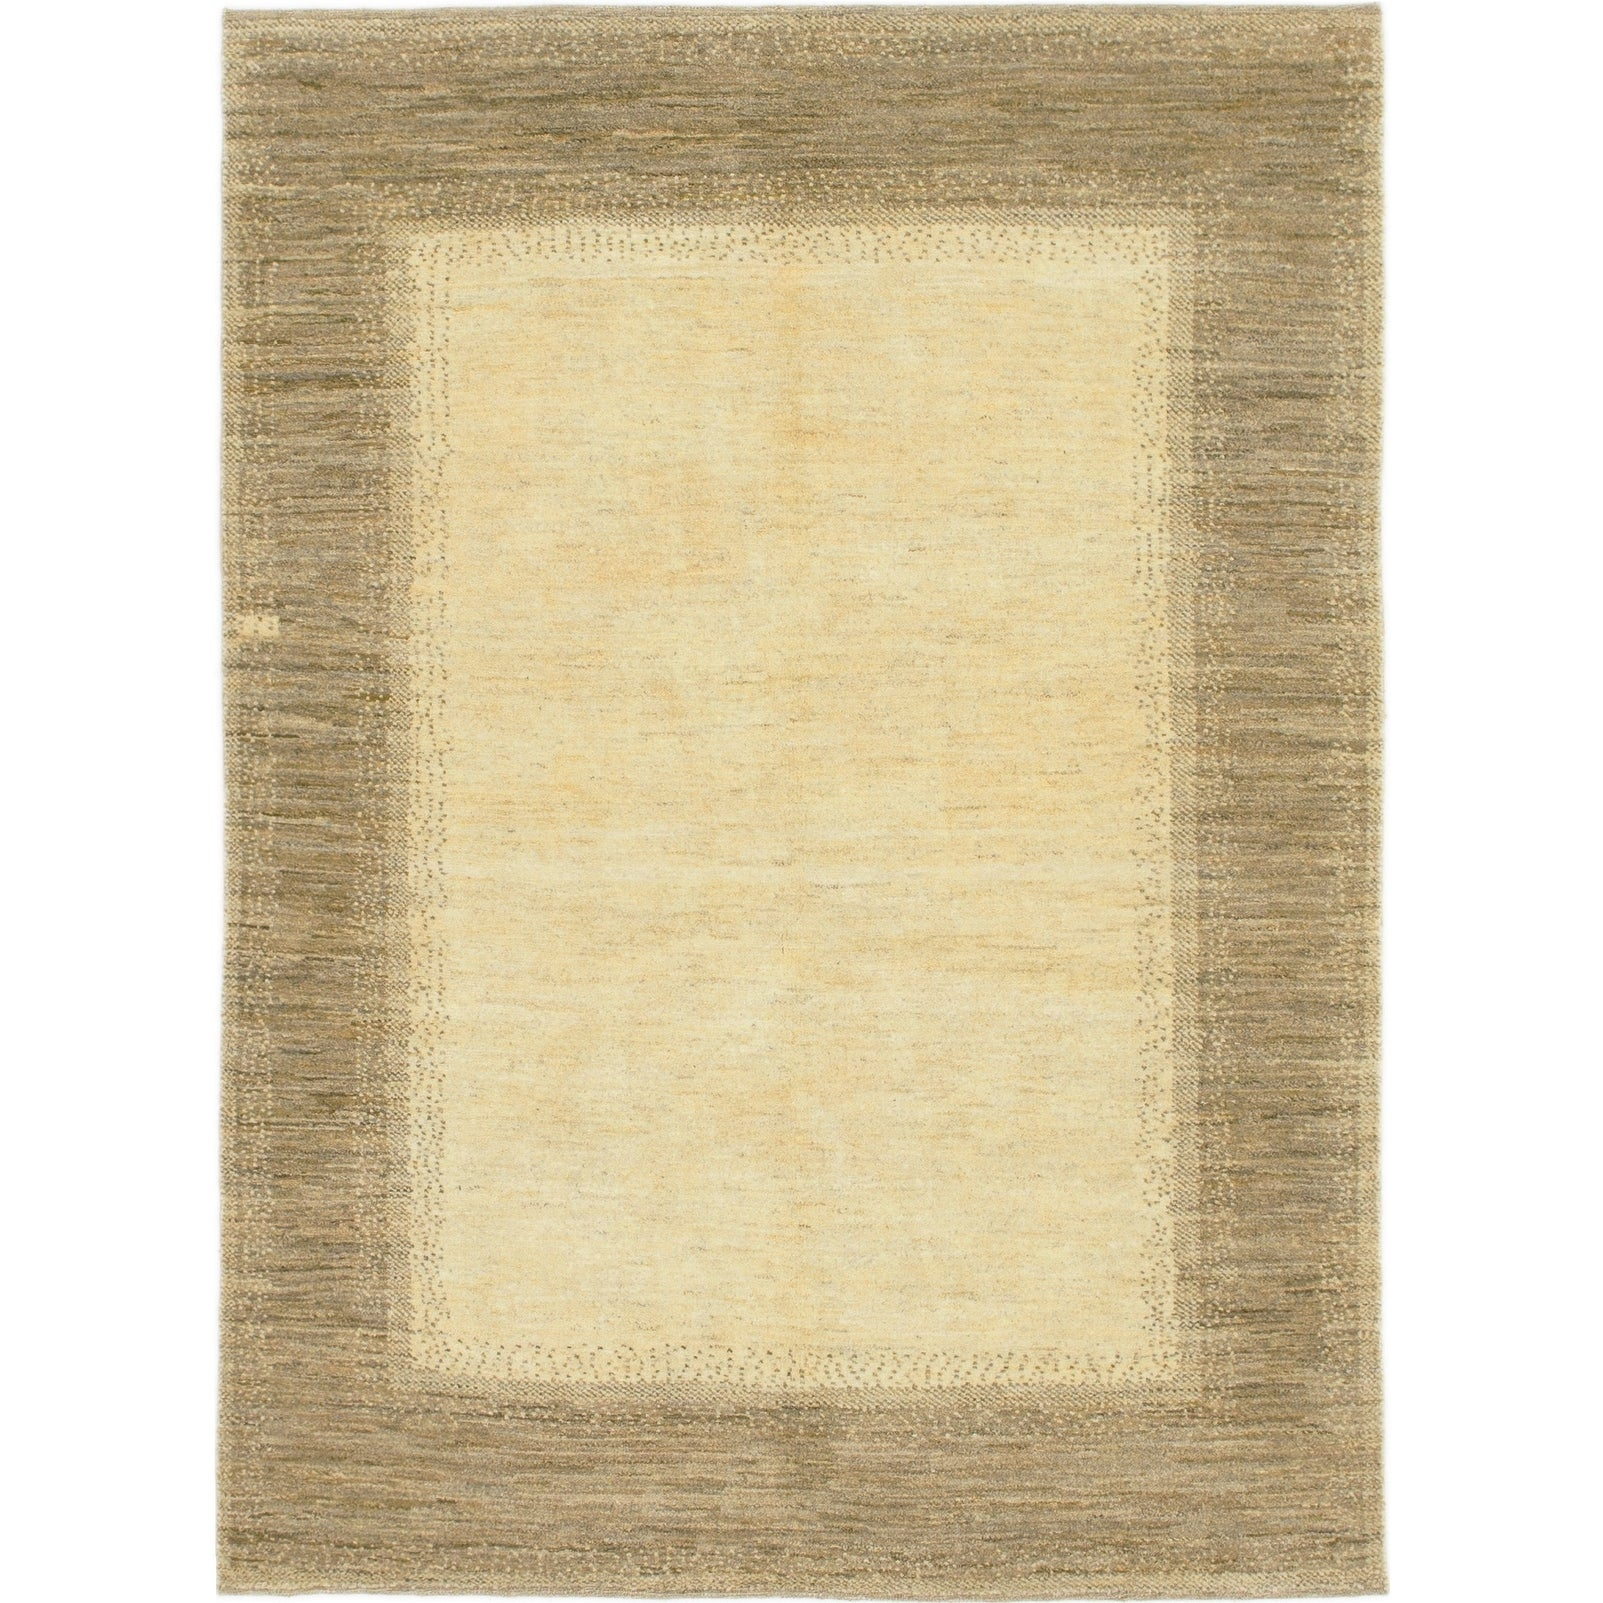 Hand Knotted Kashkuli Gabbeh Wool Area Rug - 4 9 x 6 7 (Cream - 4 9 x 6 7)